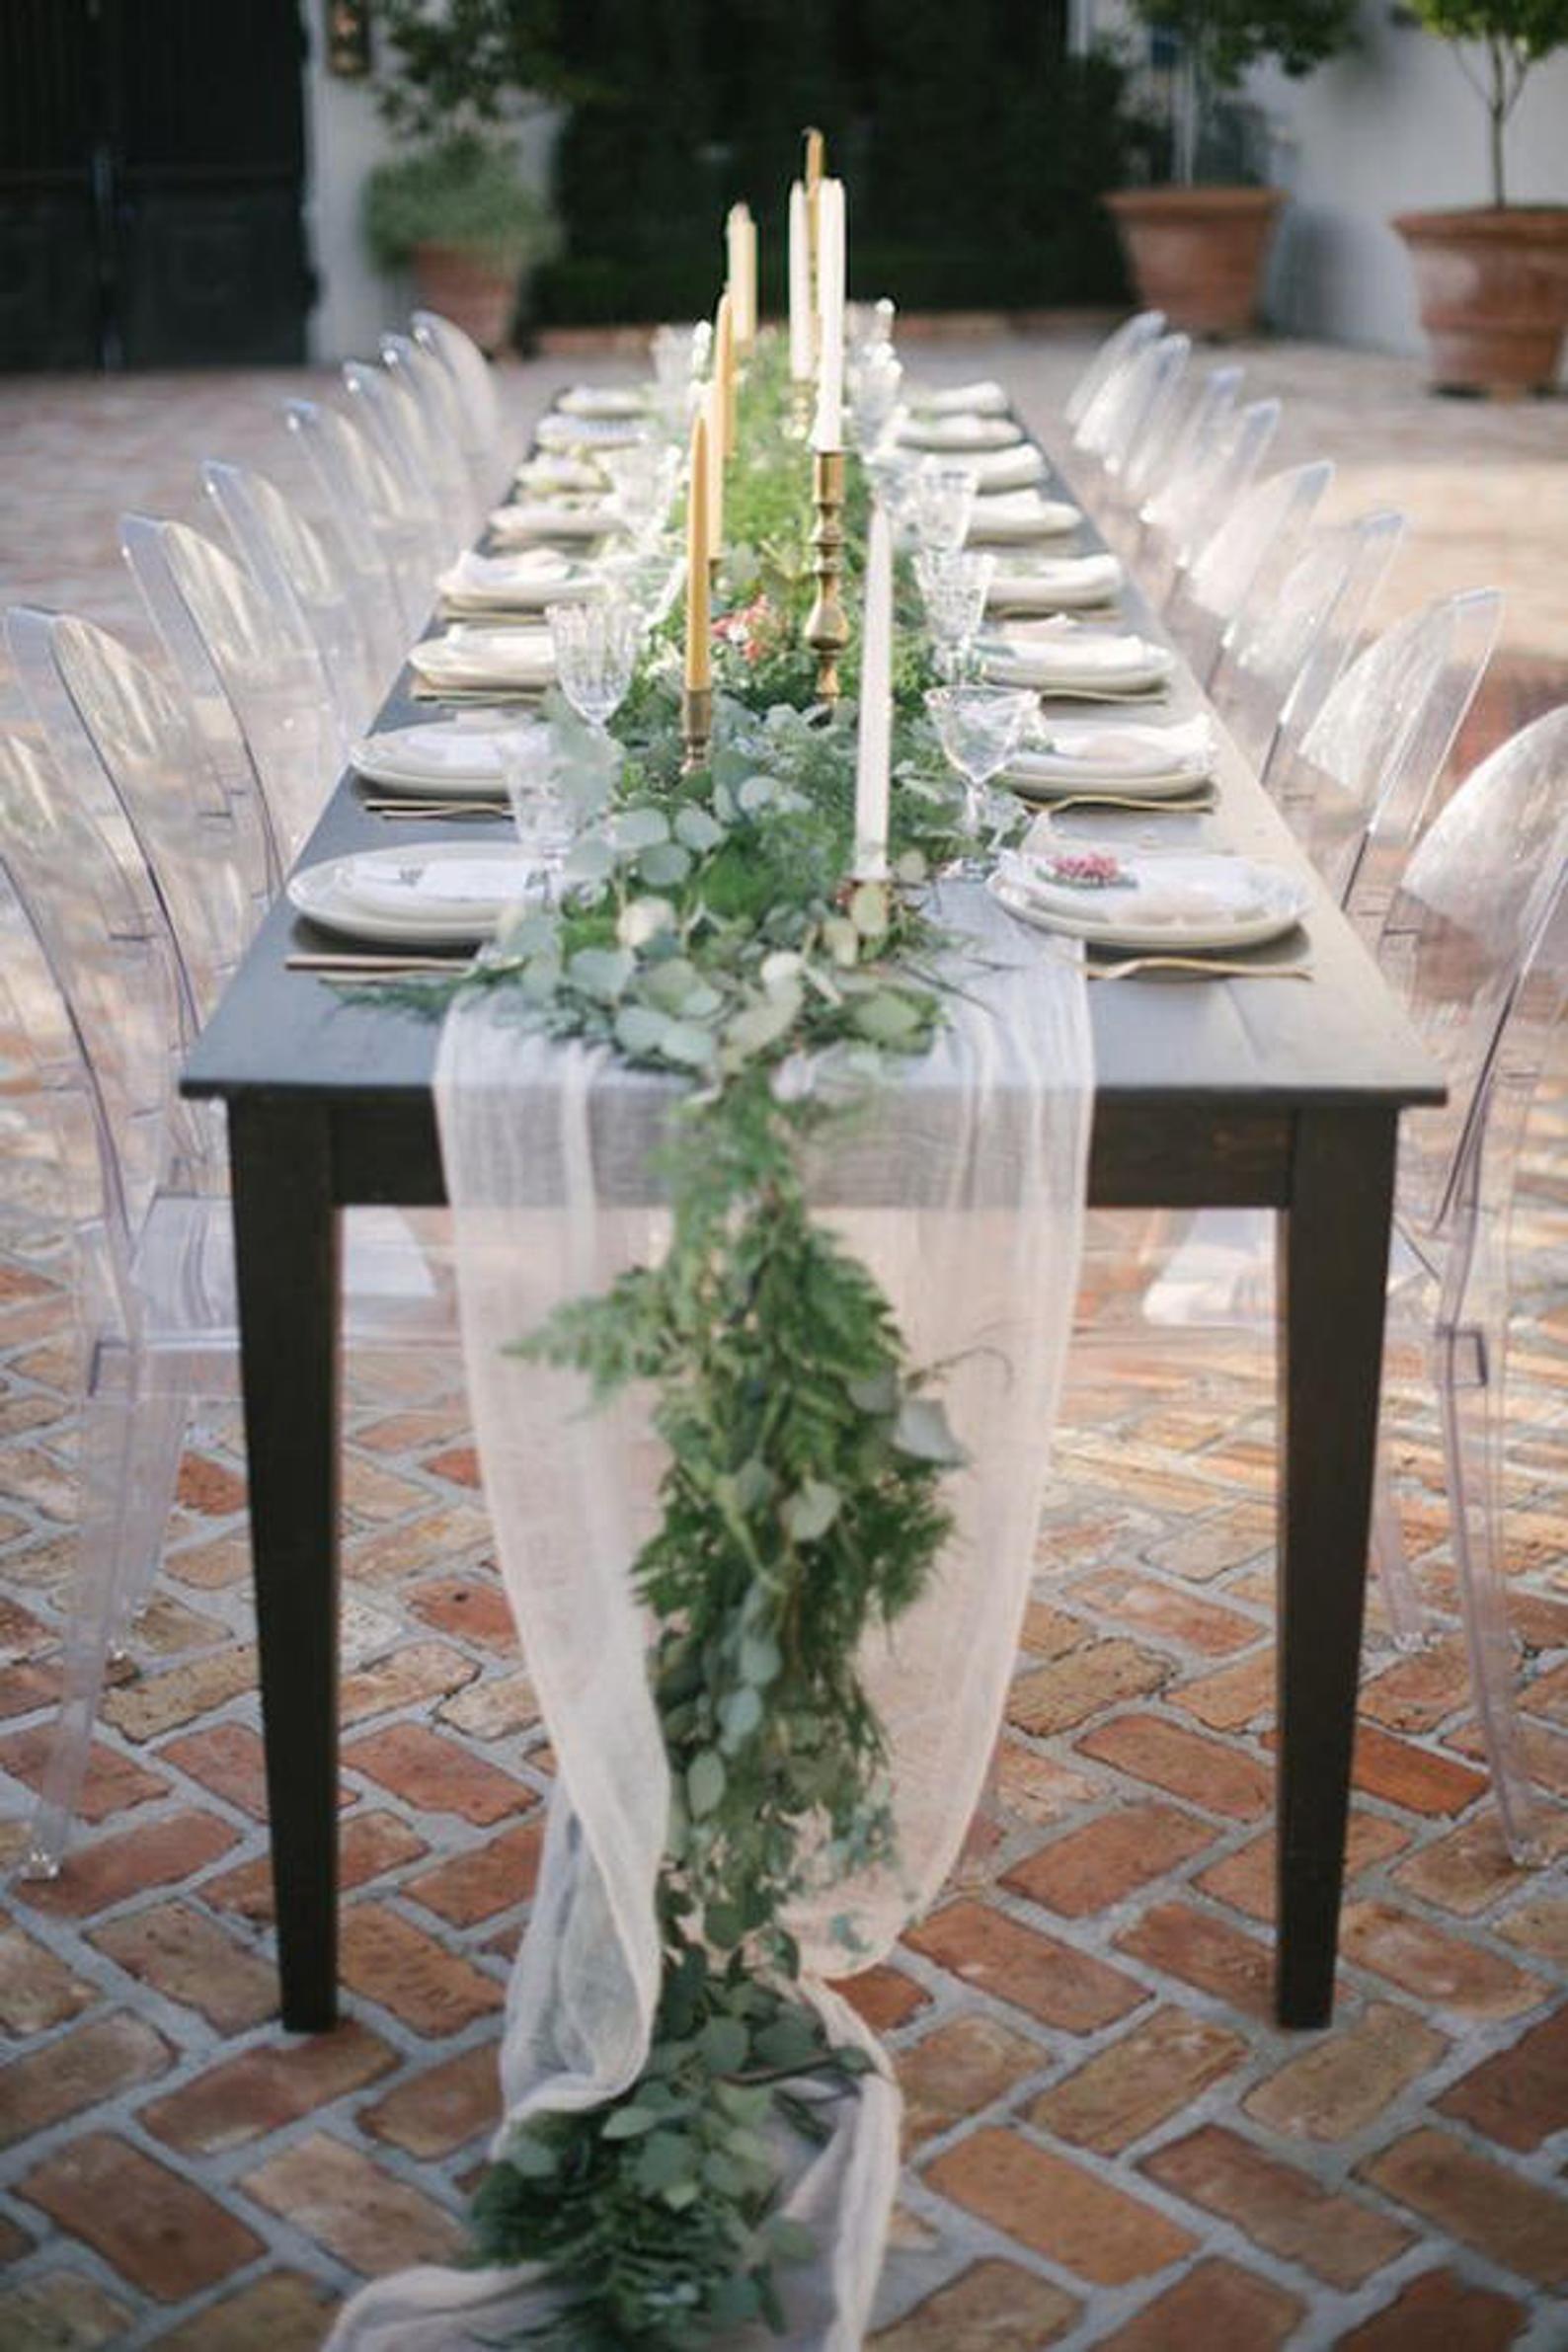 Romantic Chiffon Table Runner  Sheer White Tablecloth Décor | Etsy